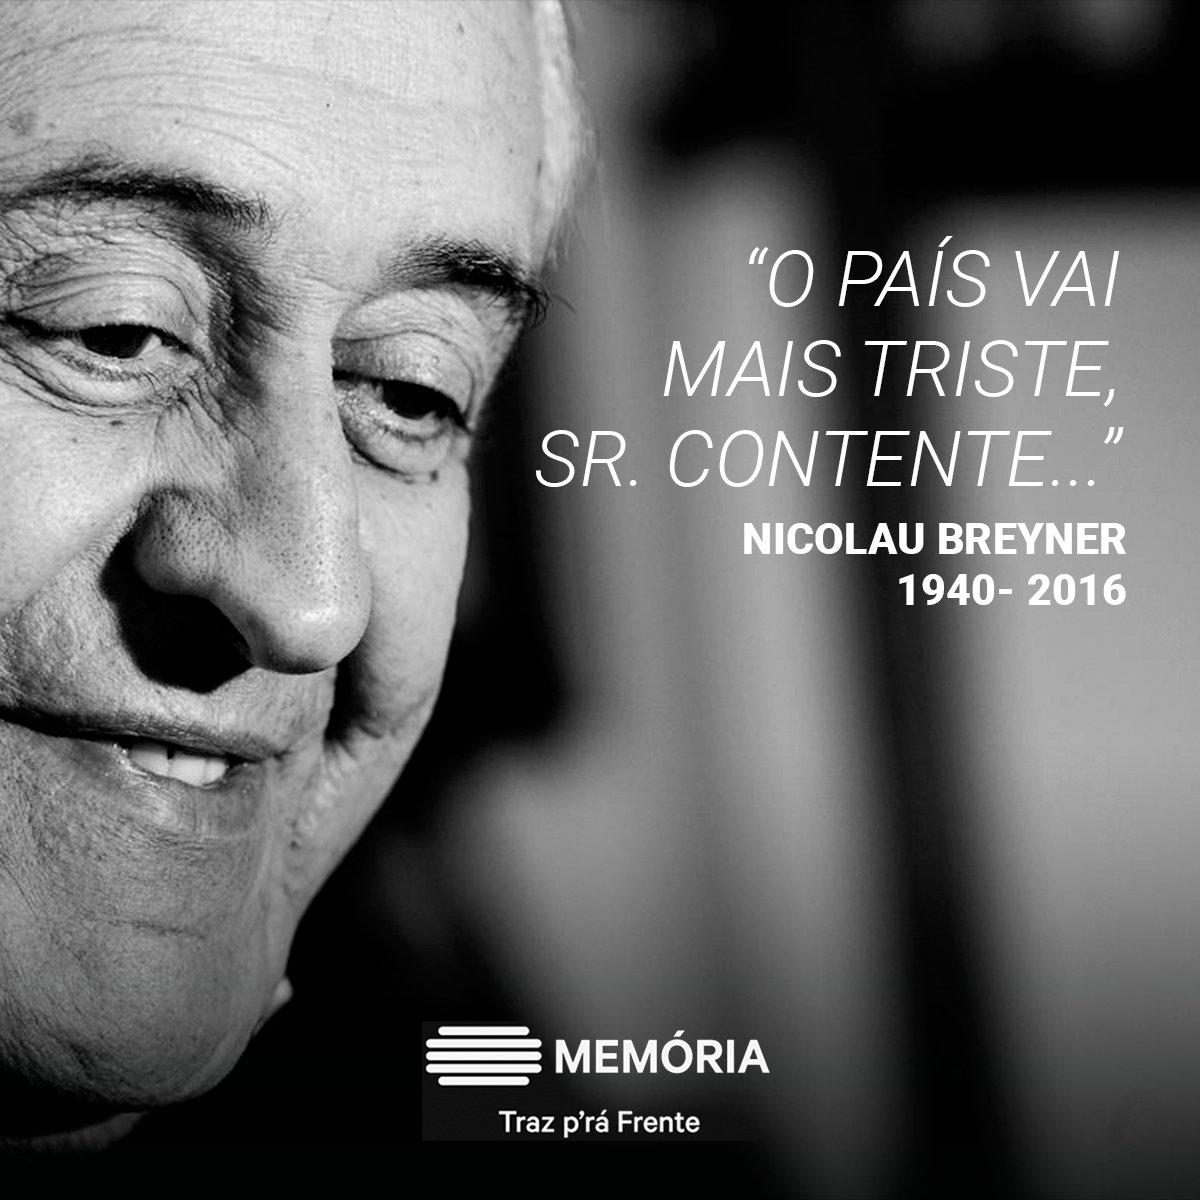 Até sempre. #NicolauBreyner https://t.co/cxbuVK7Ms7